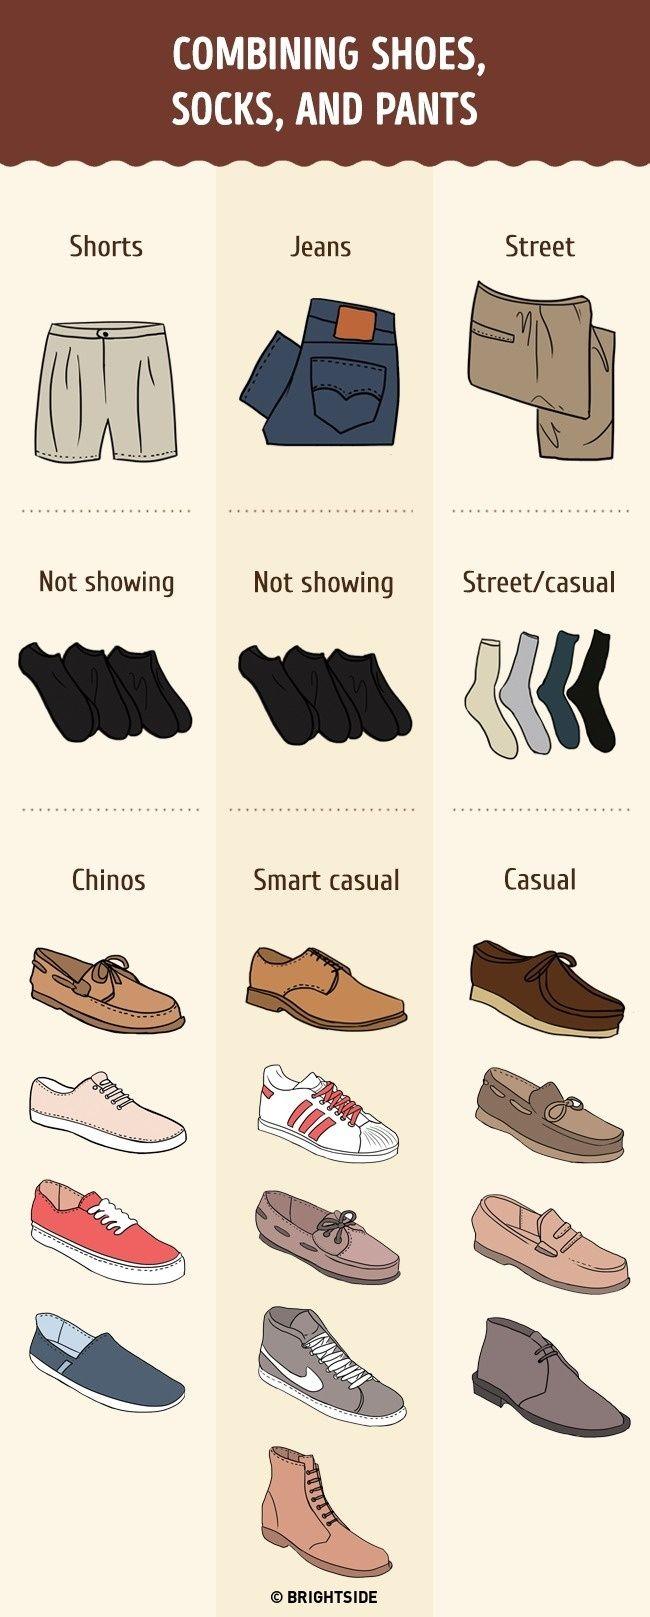 Acomplete footwear guide for men